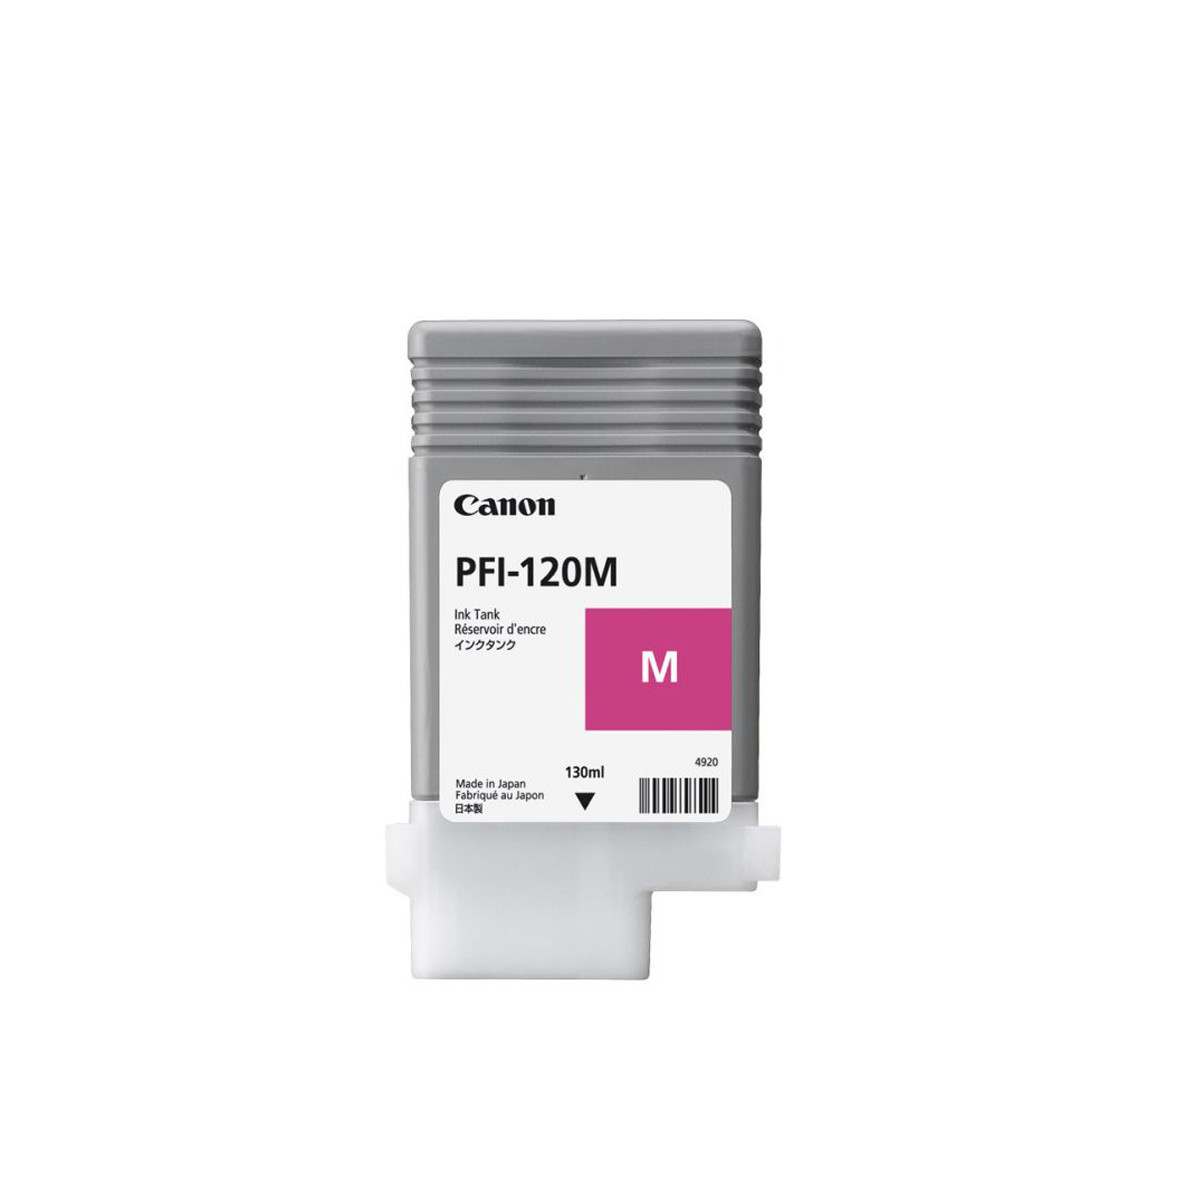 Cartucho de Tinta Canon PFI-120 PFI-120M Magenta | TM200 | Original 130ml